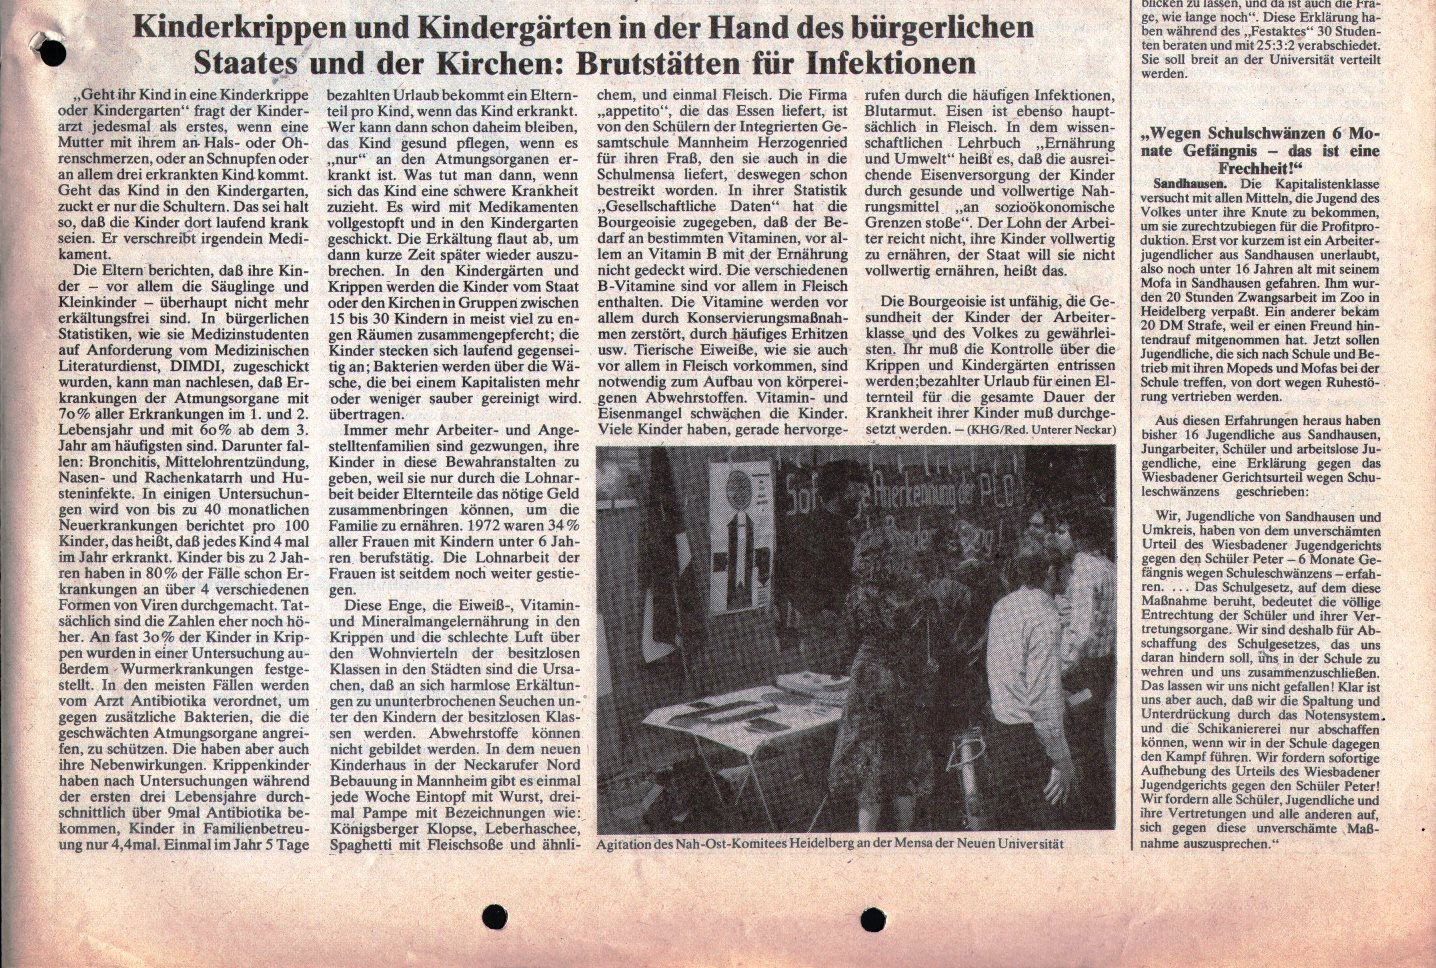 Unterer_Neckar_KBW506